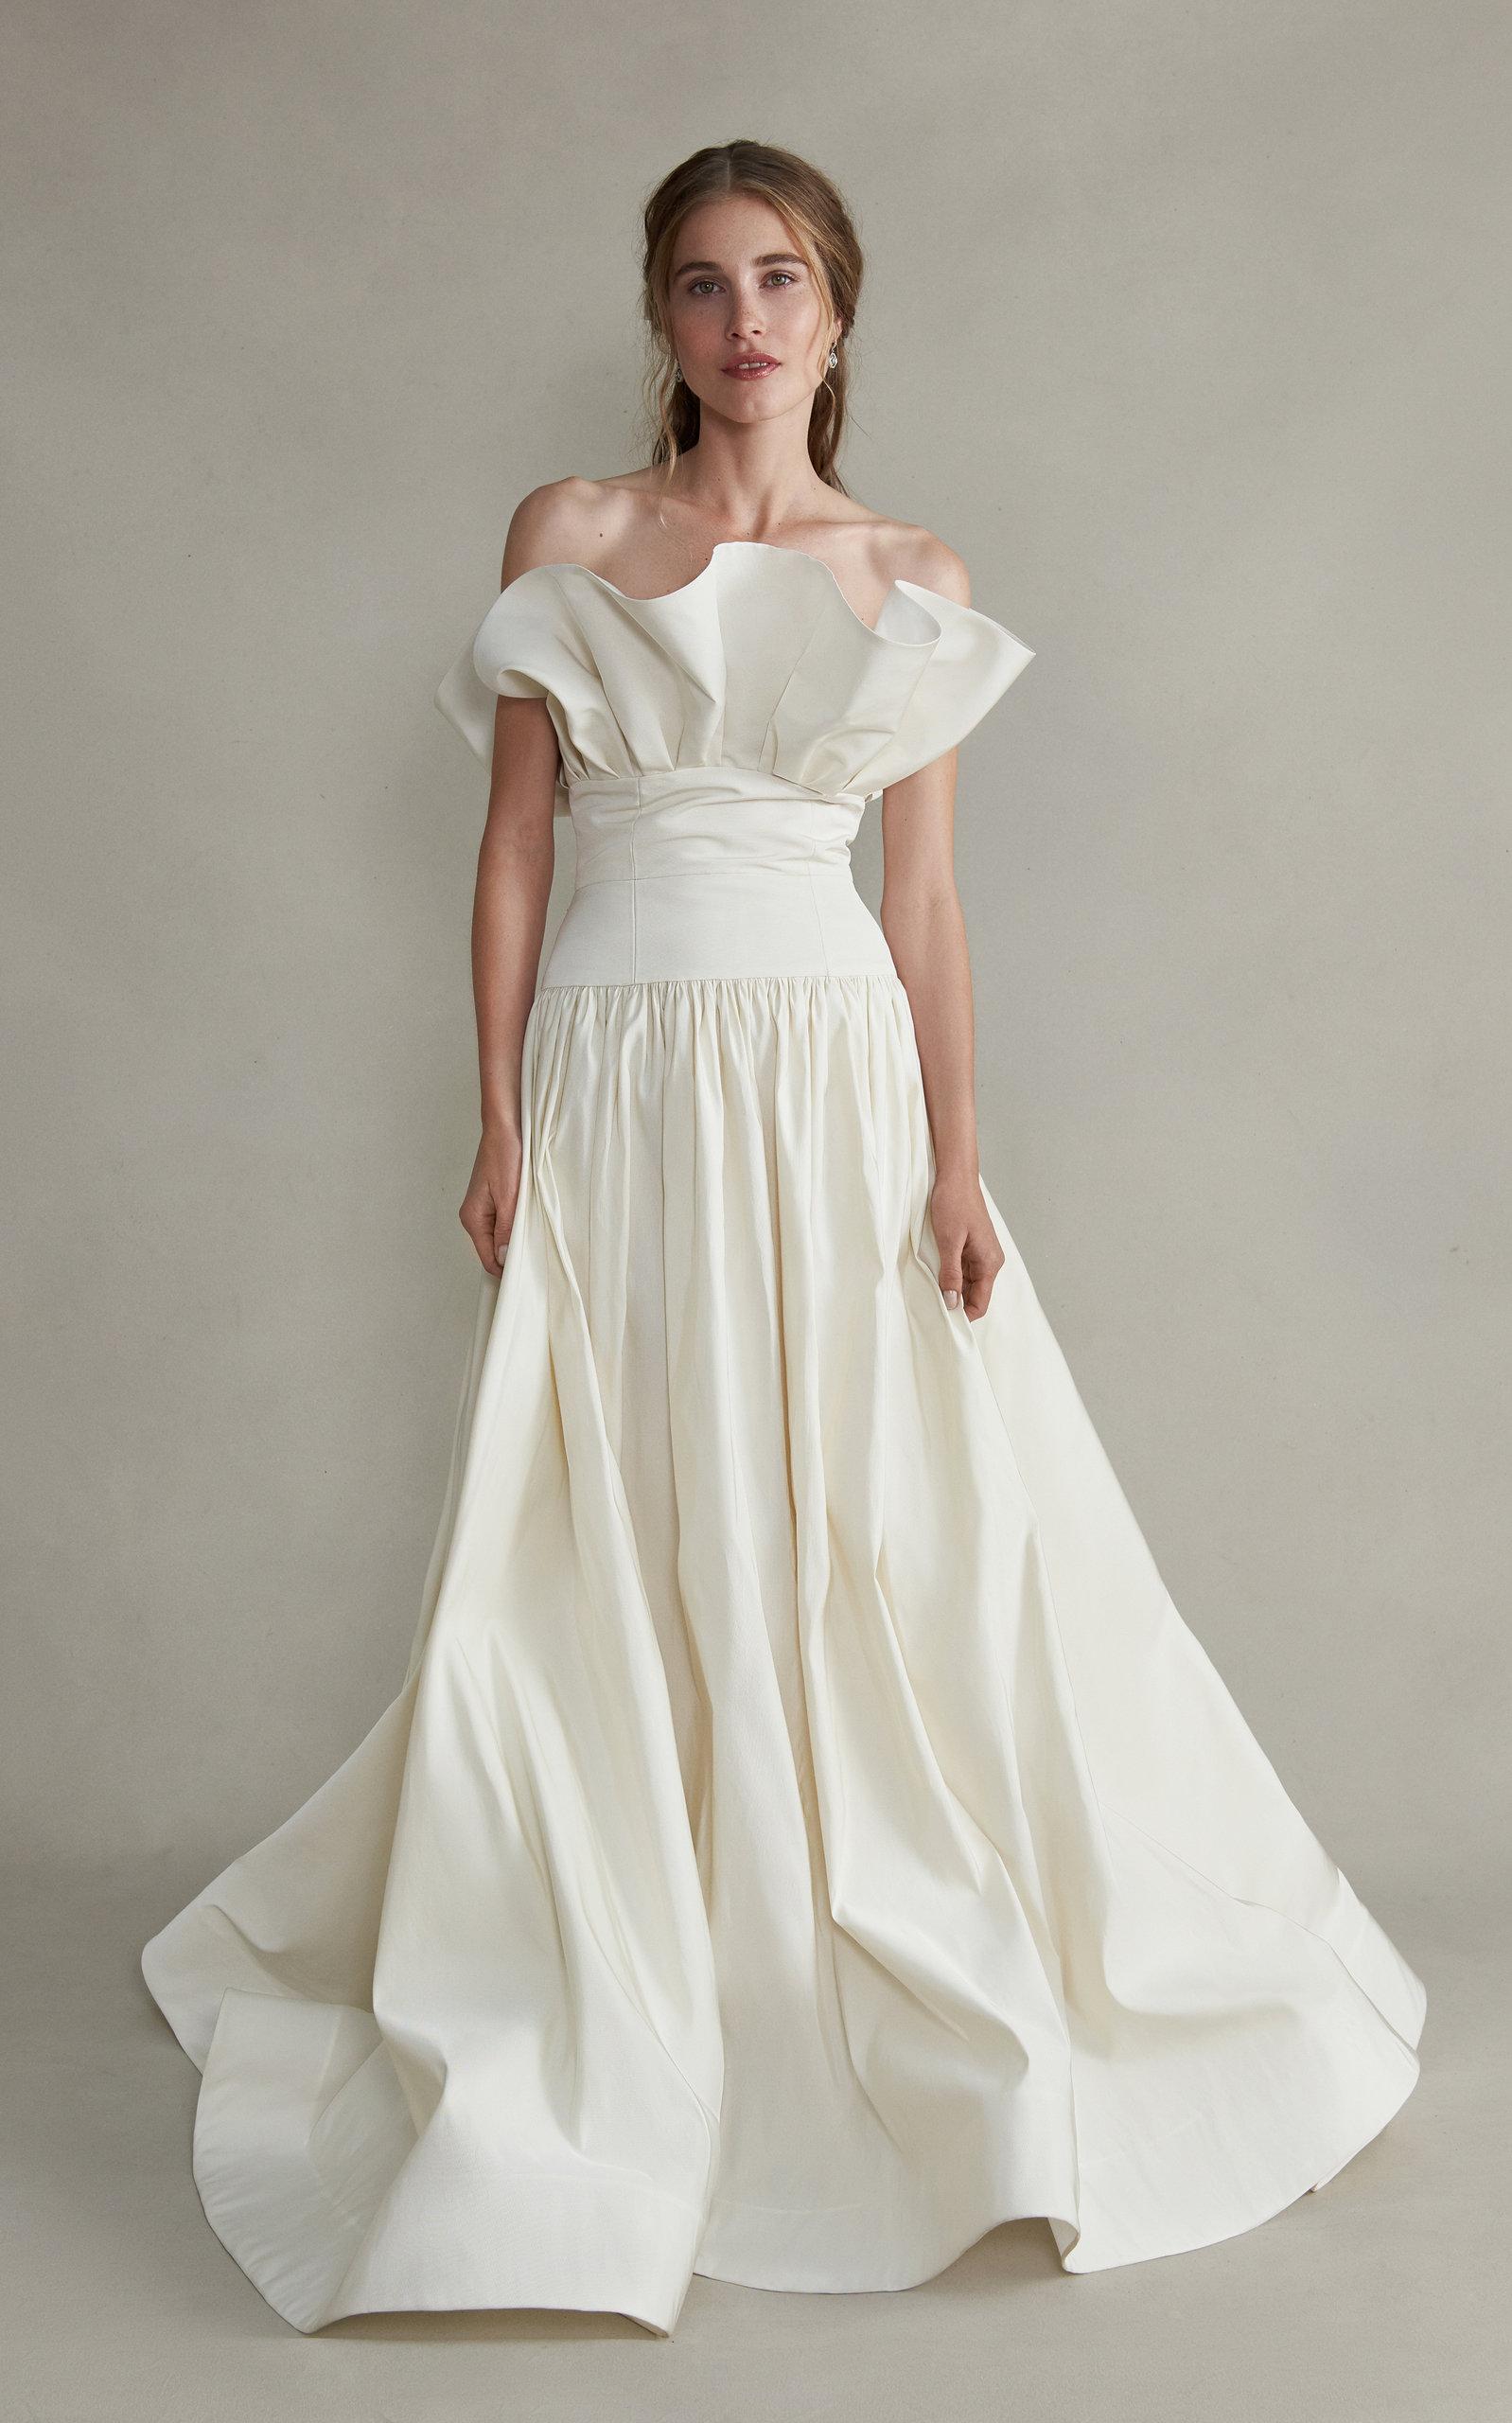 MARKARIAN Demeter Strapless Gathered Silk Gown in White